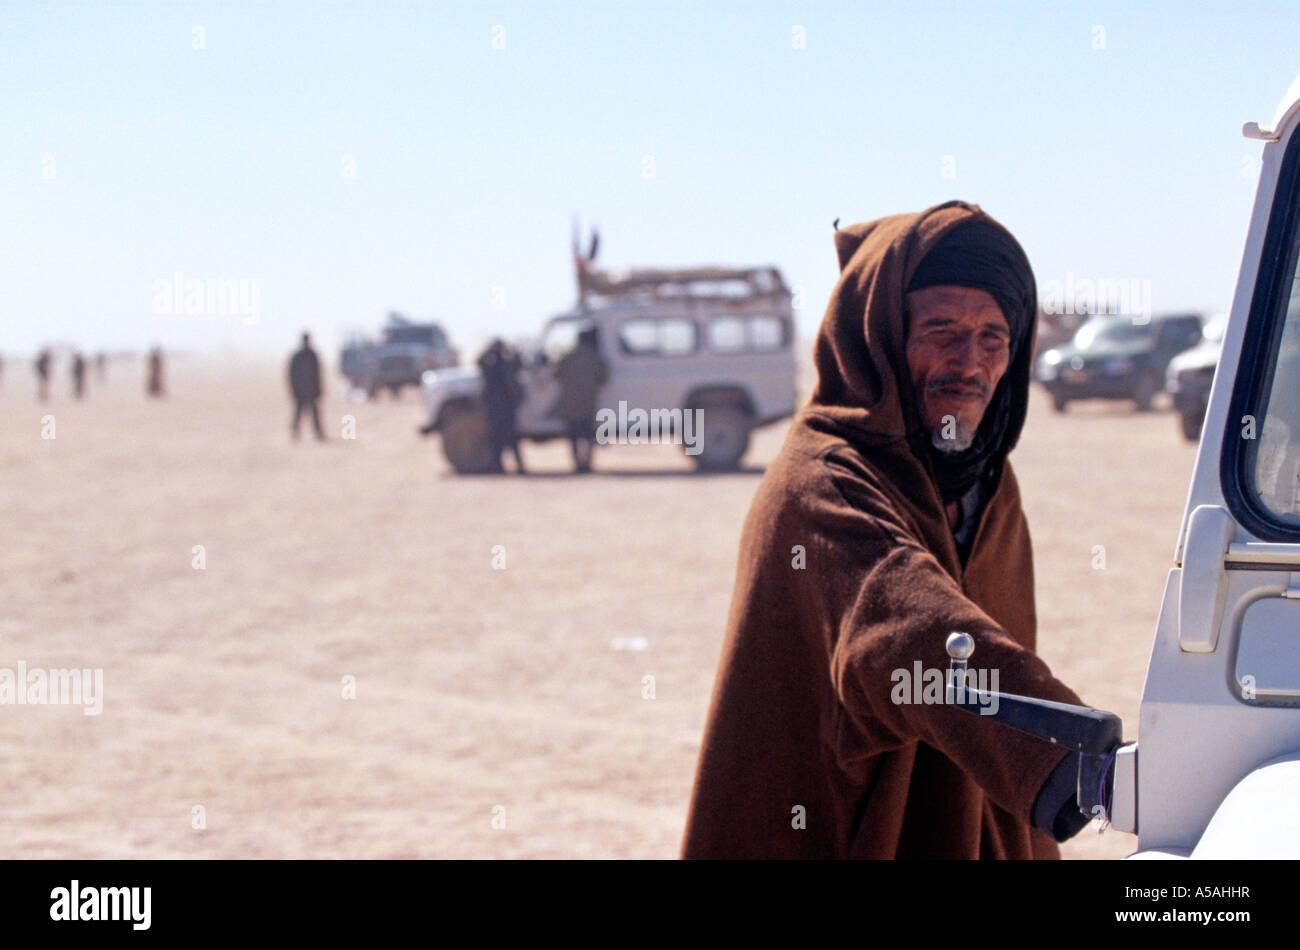 A Sahrawi man getting into his car in Tindouf Western Algeria - Stock Image